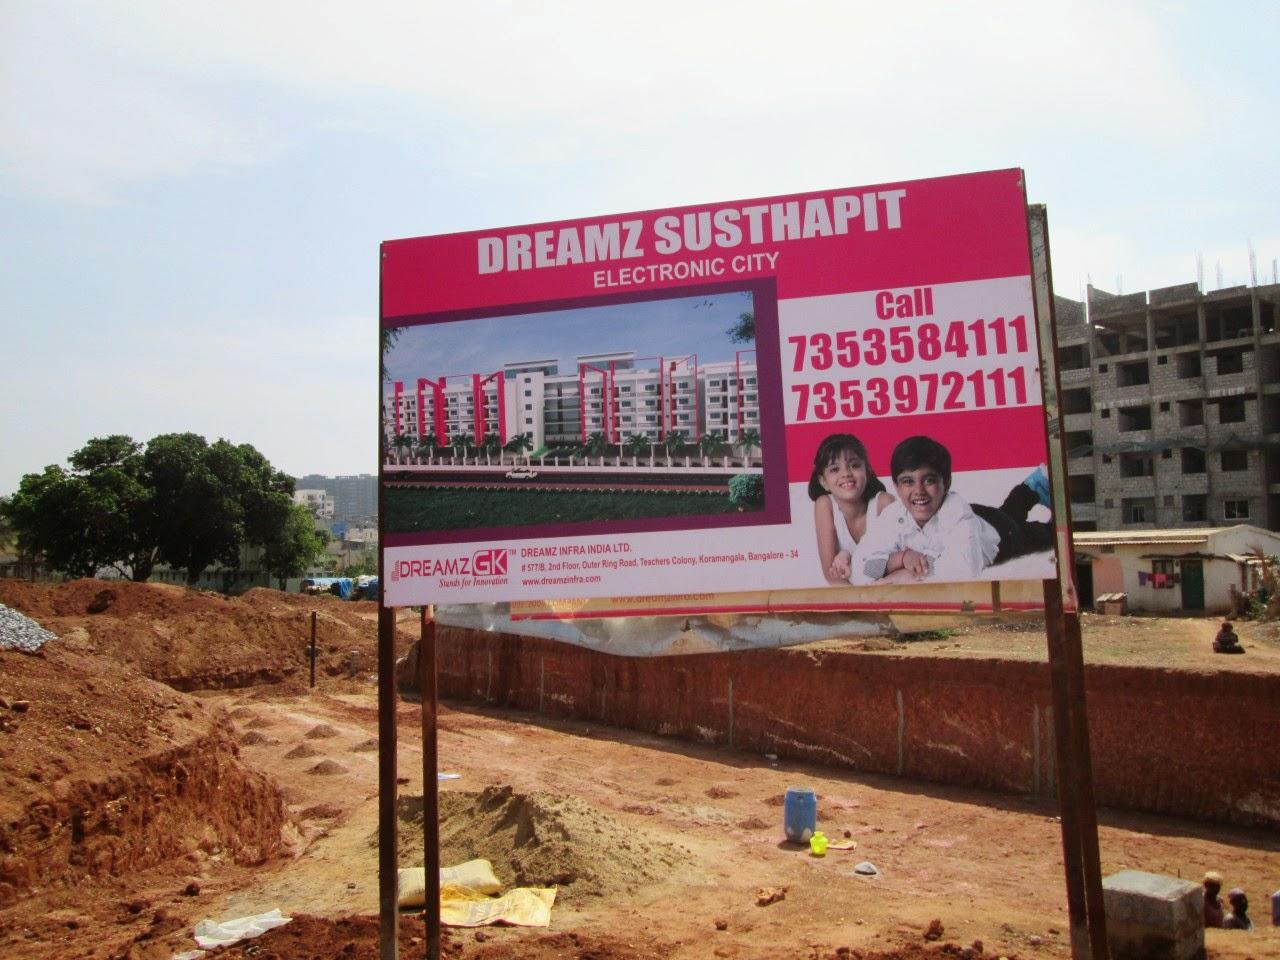 Dreamz Susthapit Status 1